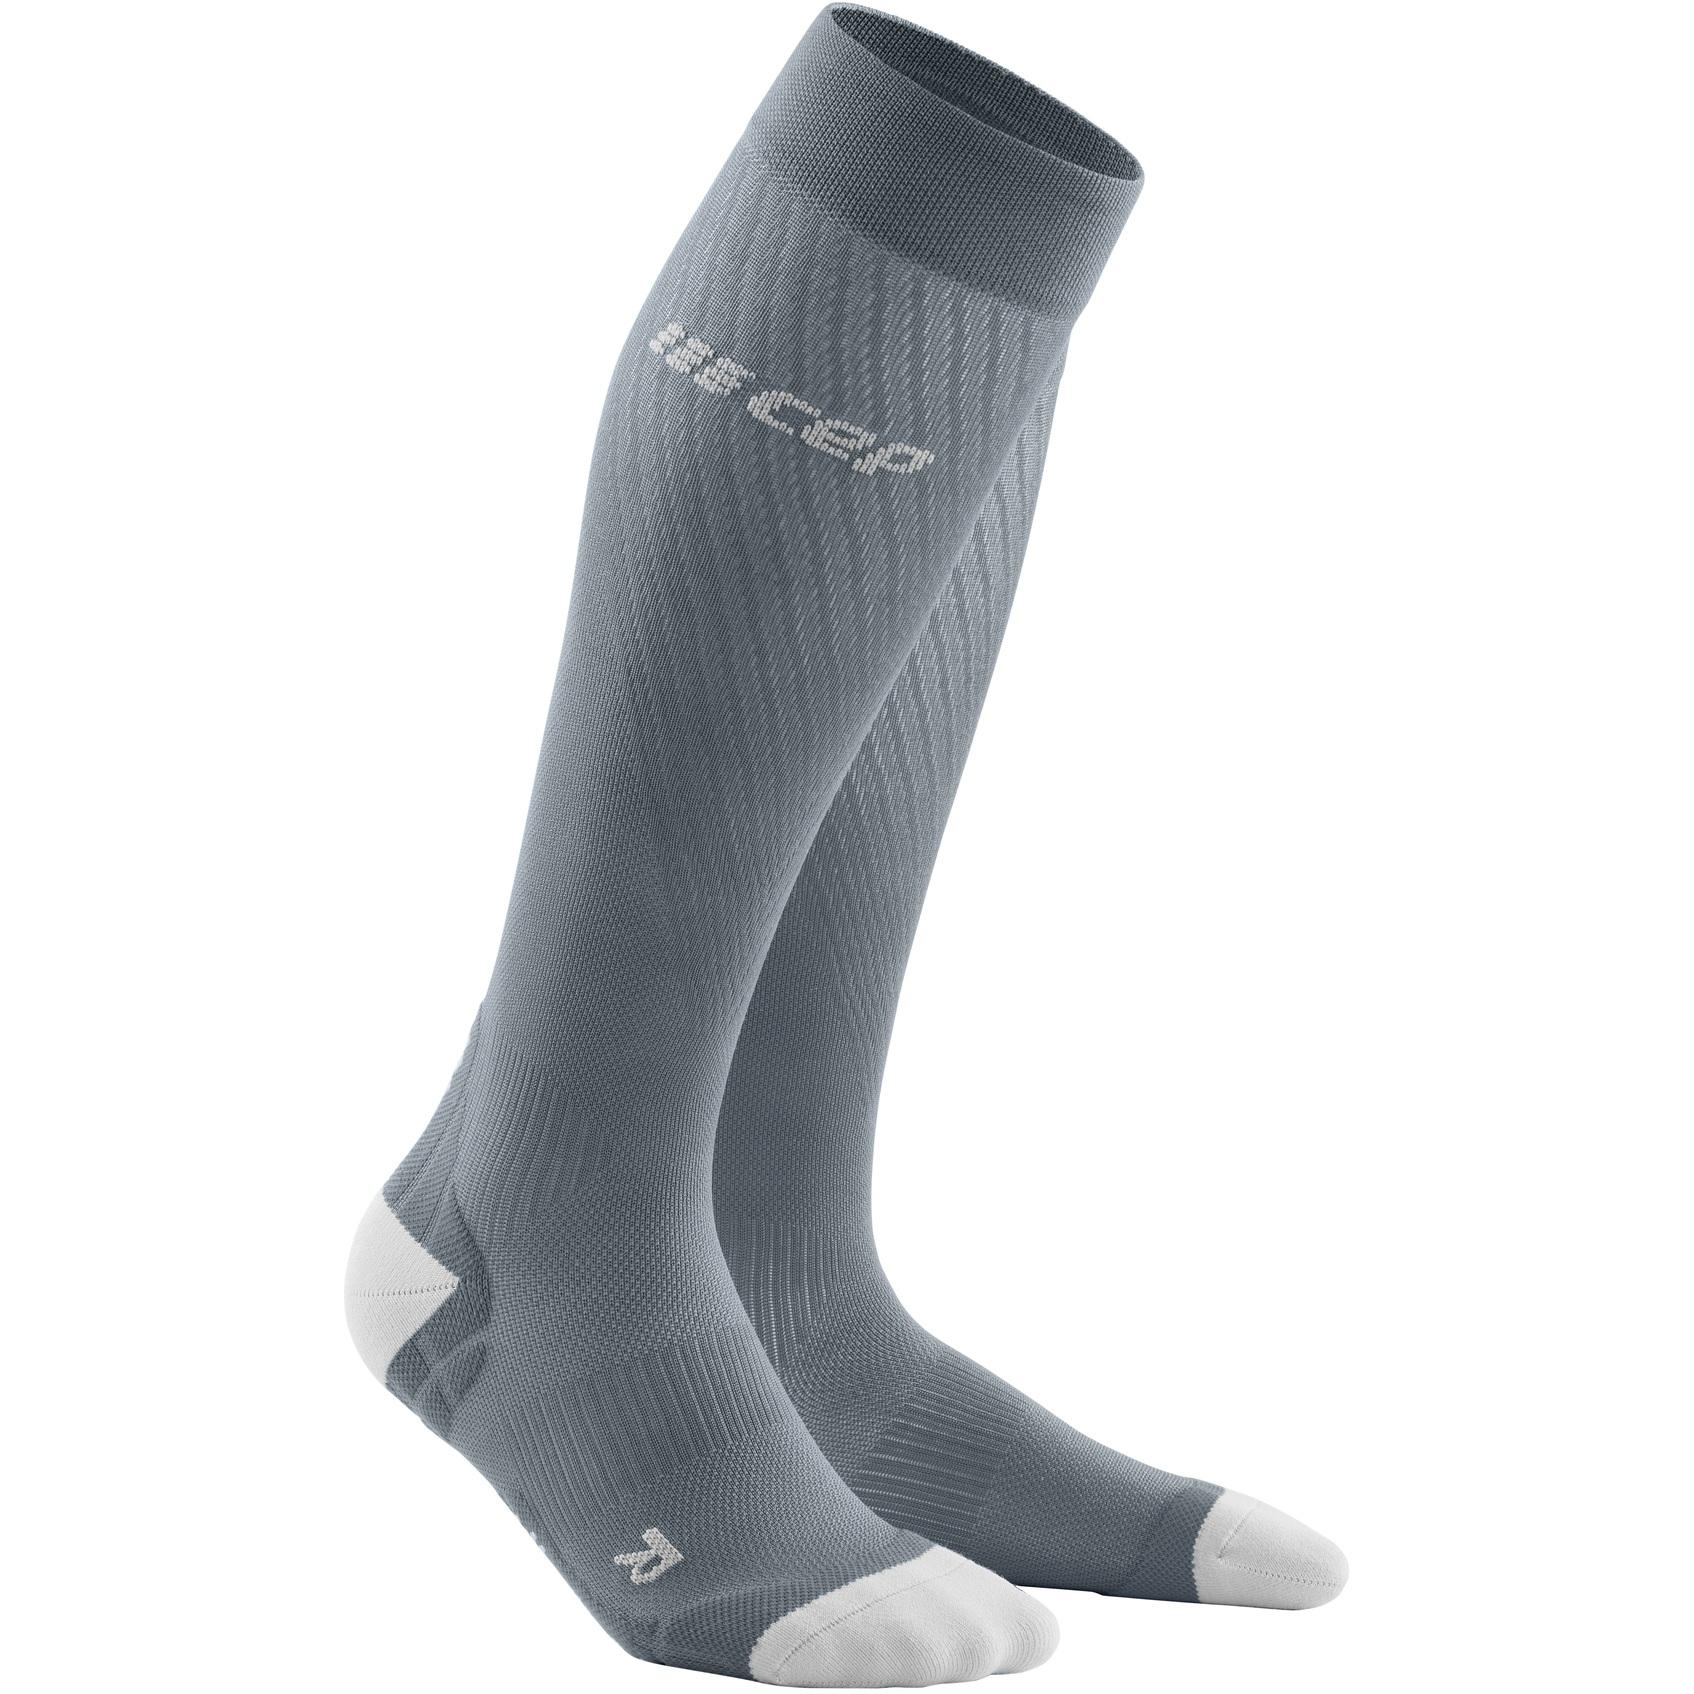 CEP Run Ultralight Compression Socks Women - grey/light grey HW21